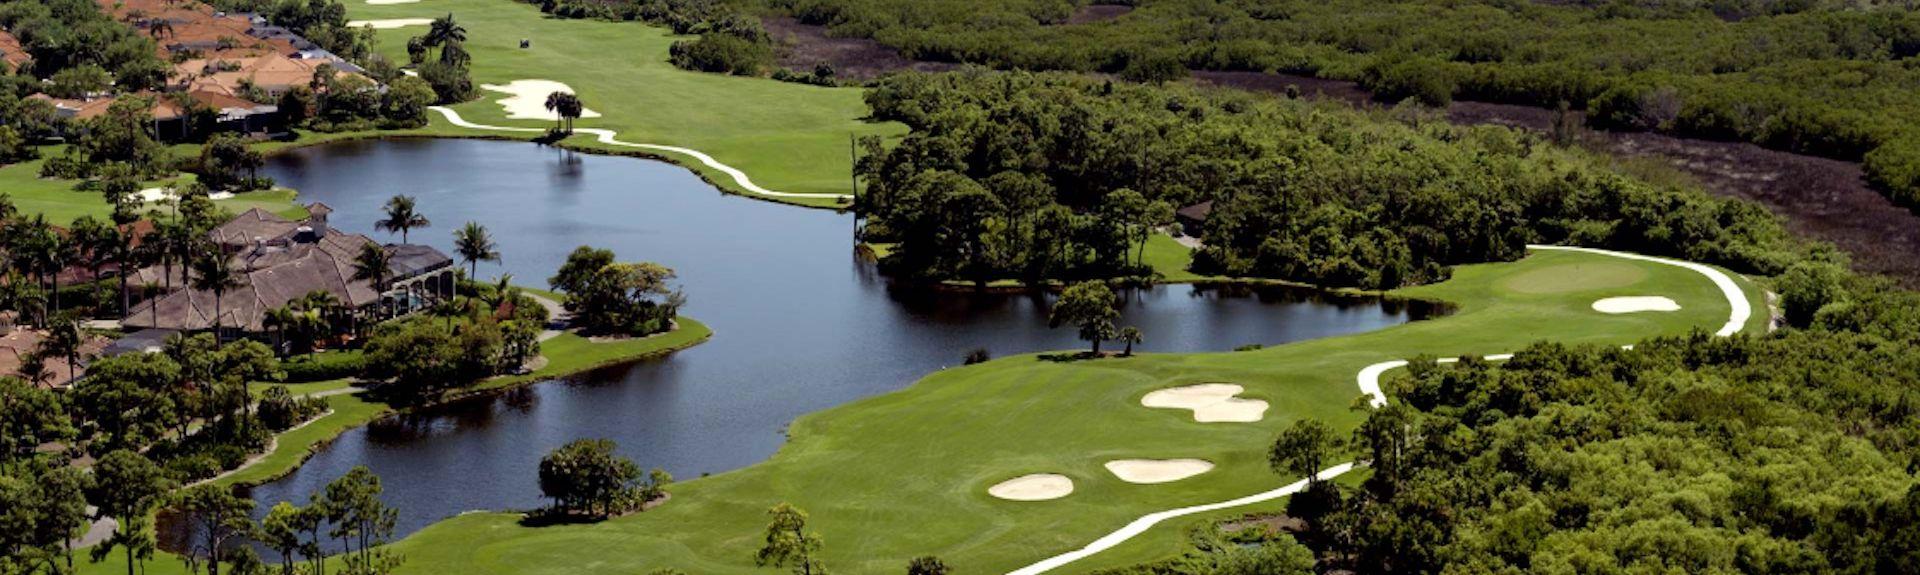 Conservancy of Southwest Florida, Naples, Florida, United States of America